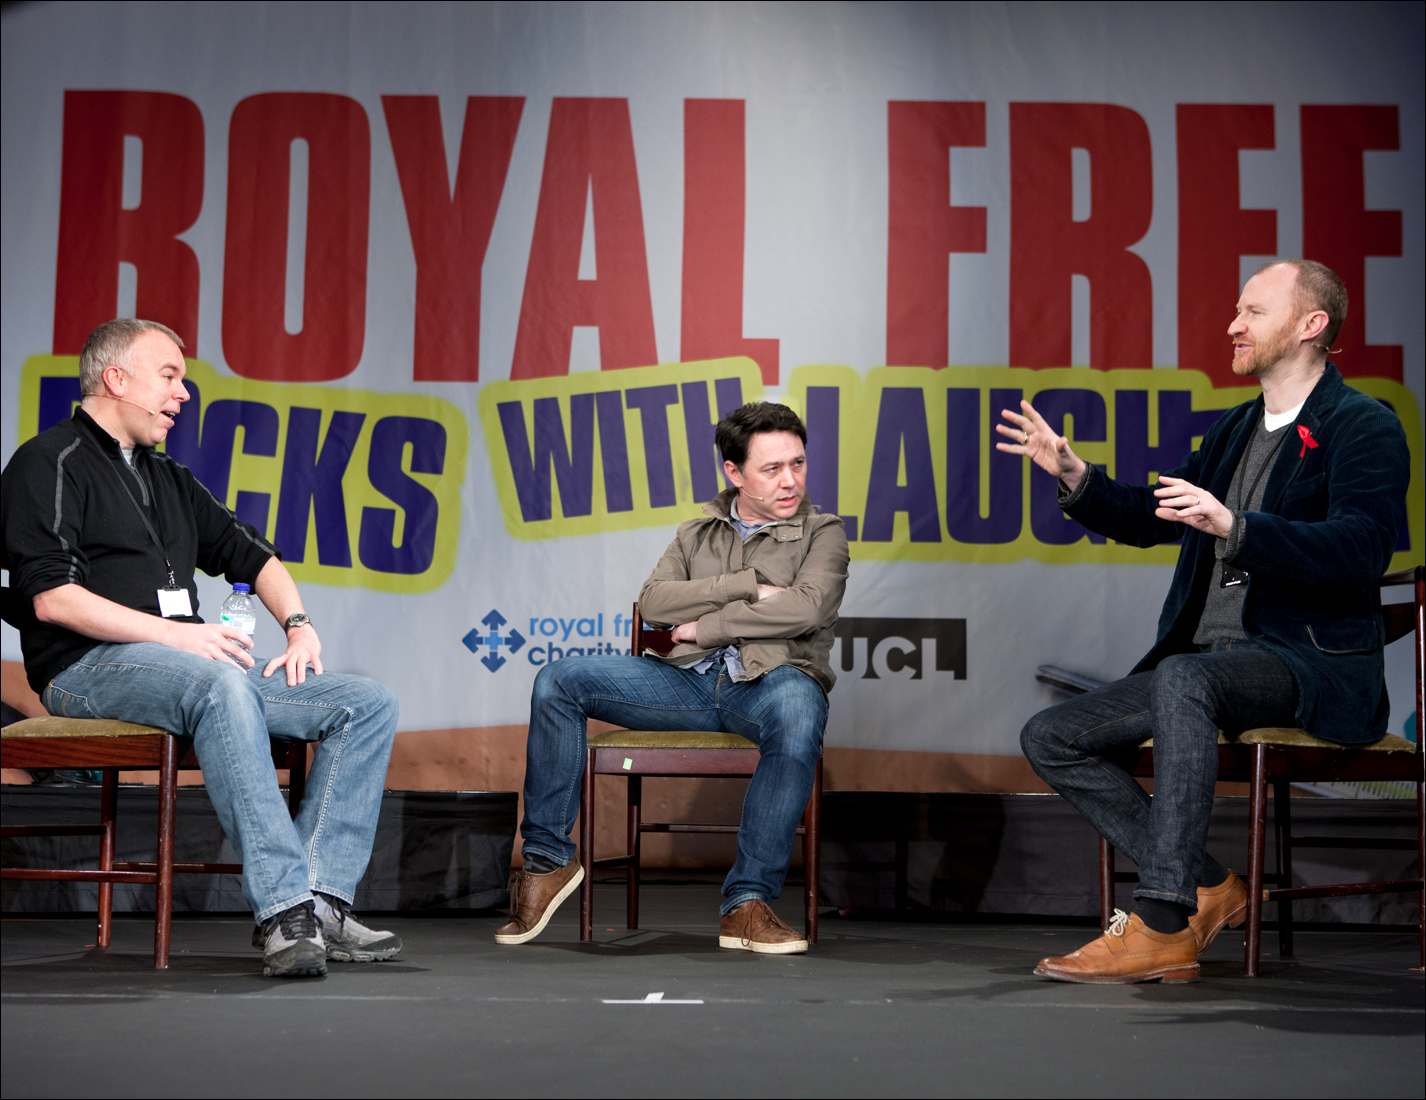 Steve Pemberton, Reece Shearsmith and Mark Gatiss